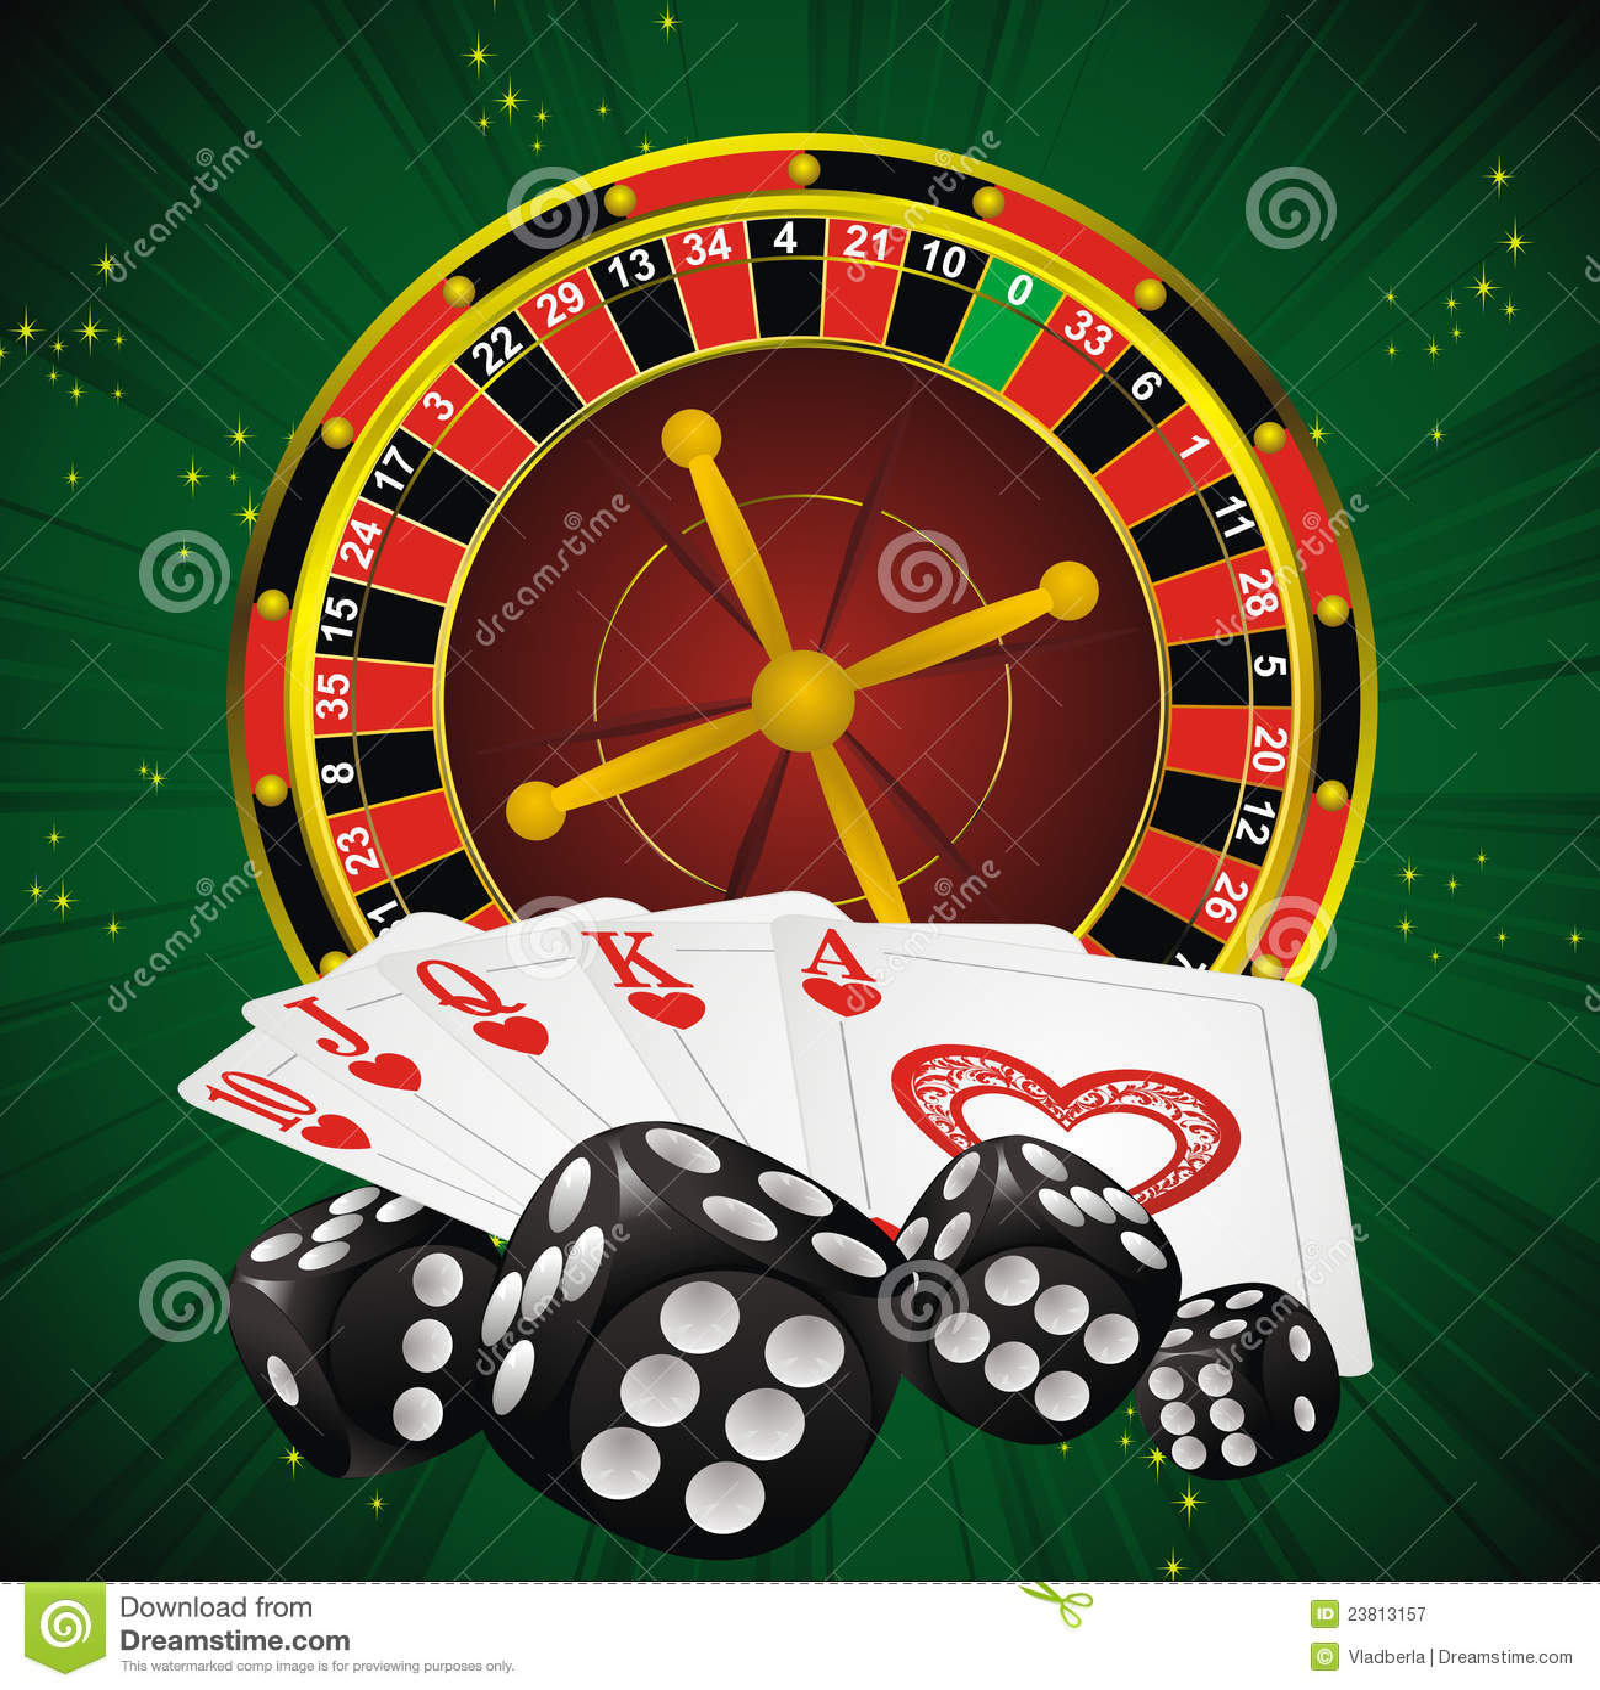 golden online casino faust symbol